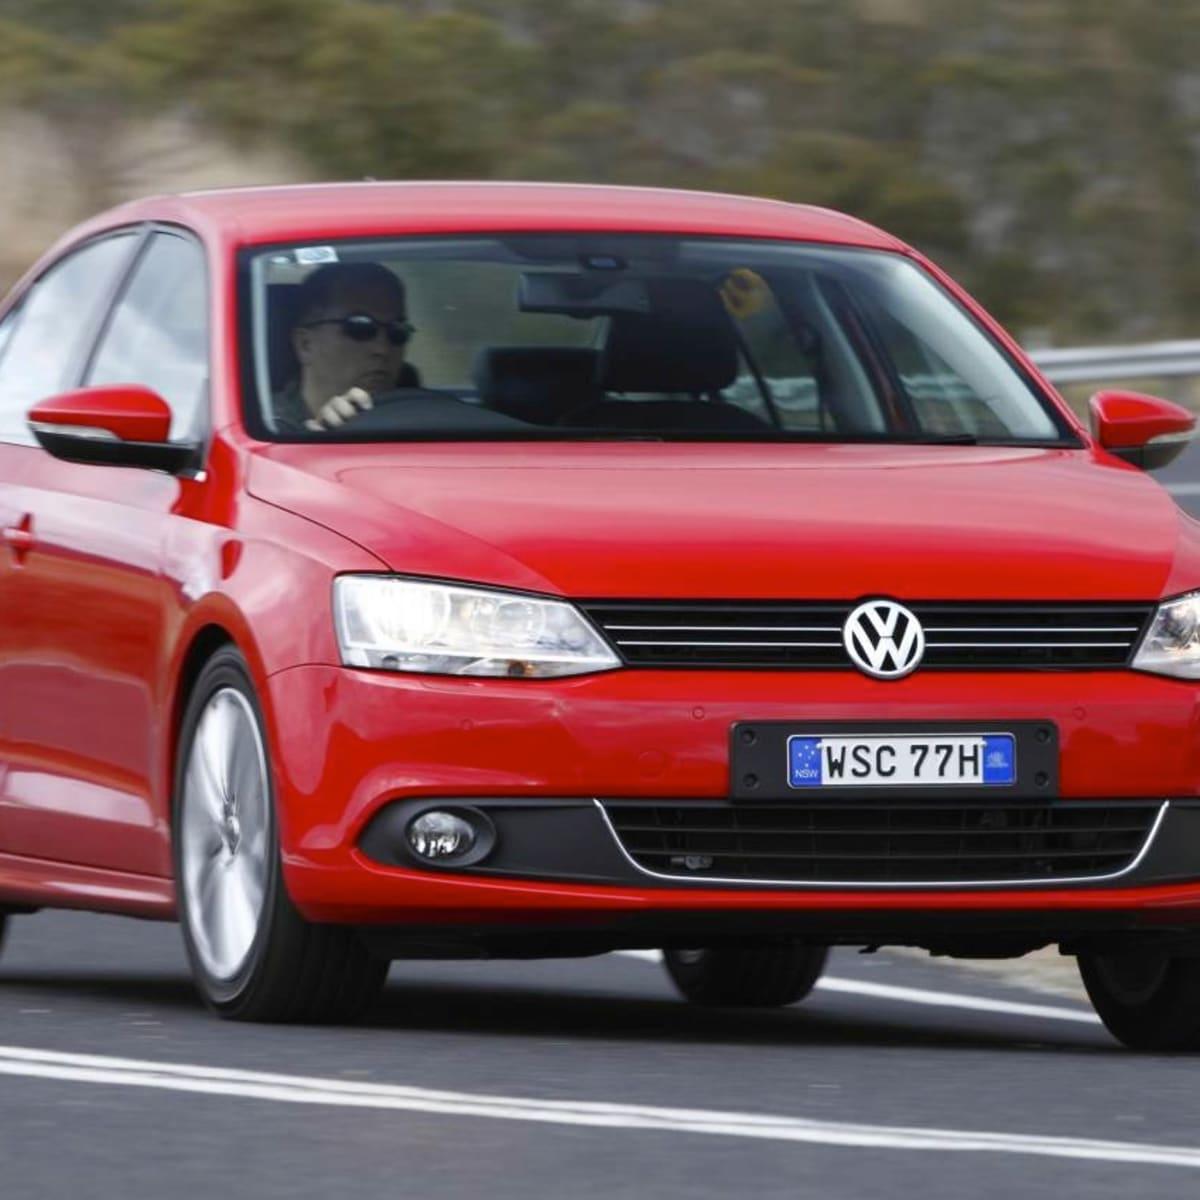 Volkswagen Australia recalls 25,000 cars over DSG defect | CarAdvice